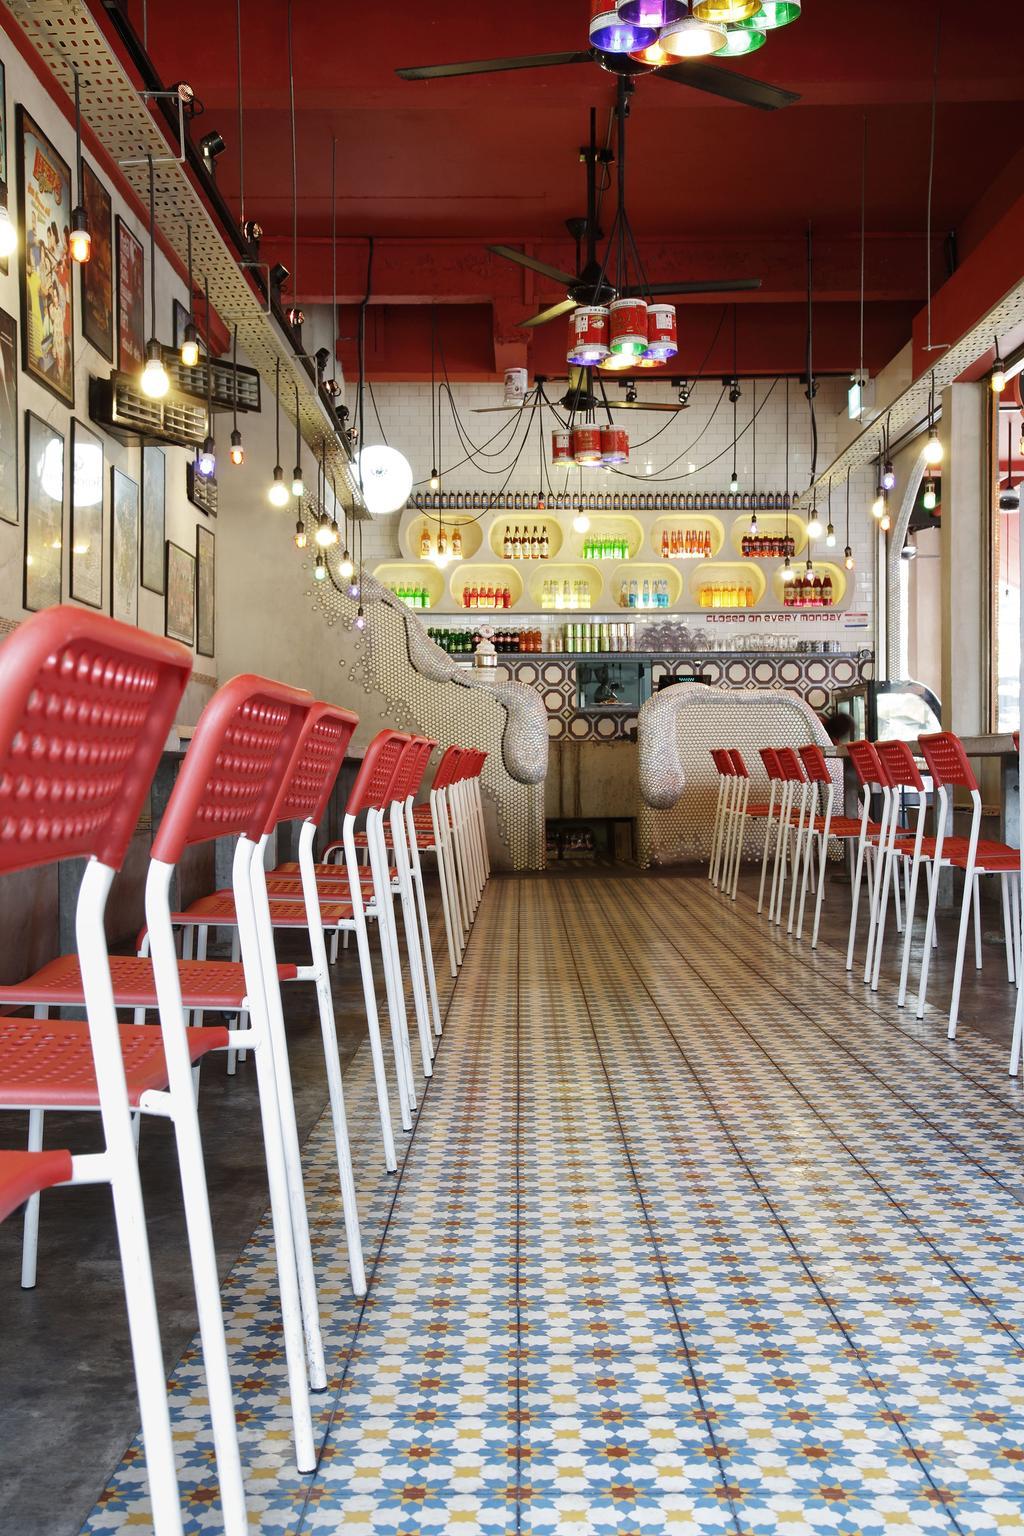 Tom Yum Kung Fu - Serangoon Garden, Commercial, Interior Designer, Free Space Intent, Vintage, Hanging Lights, Exposed Lightbulb, Mosaic Tiles, Chair, Furniture, Diner, Food, Meal, Restaurant